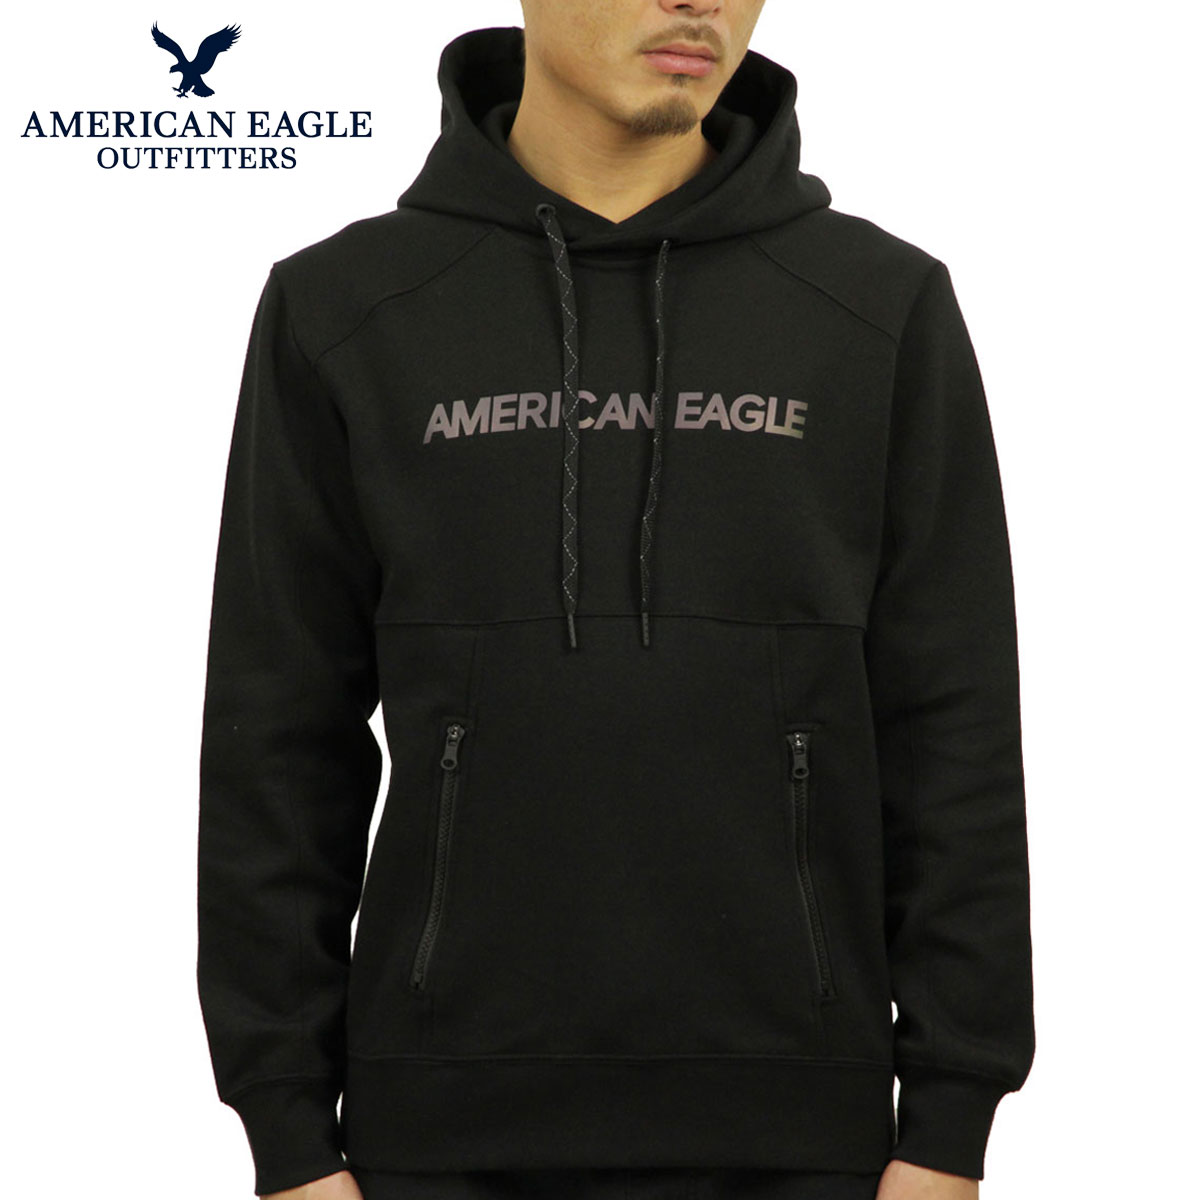 ba34a10f7 American eagle AMERICAN EAGLE regular article men fleece pullover parka AE  ACTIVE REFLECTIVE GRAPHIC POPOVER HOODIE ...